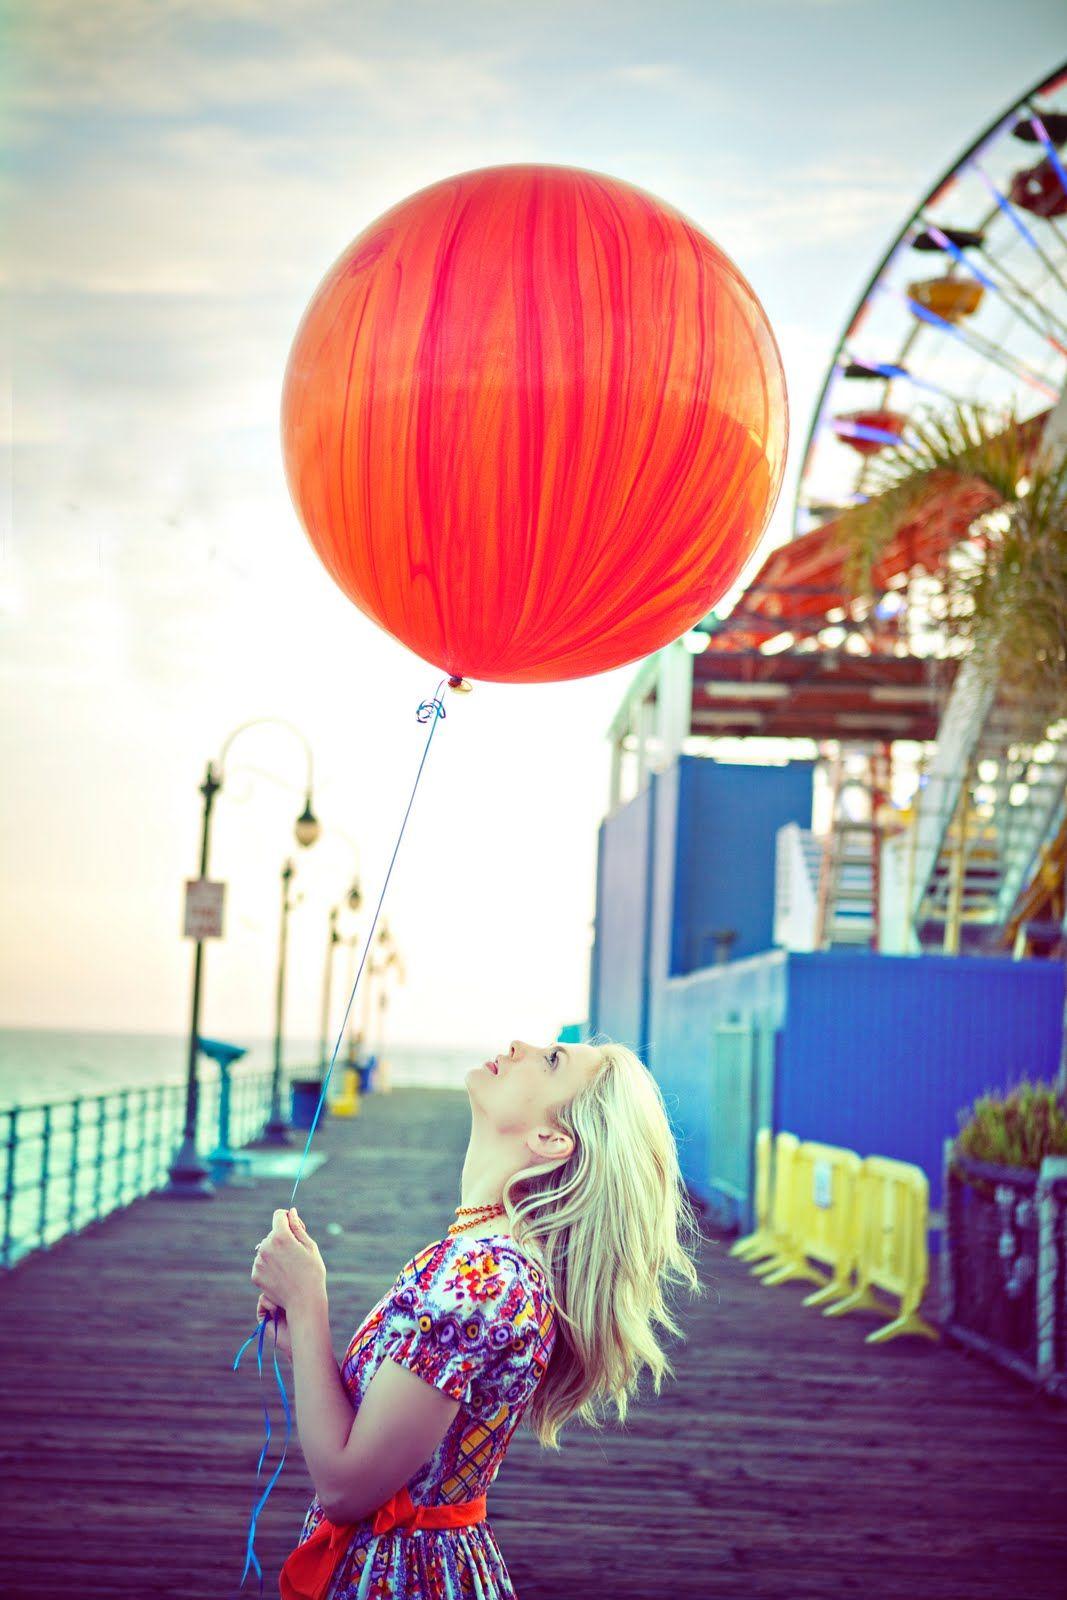 #balloon on #boardwalk